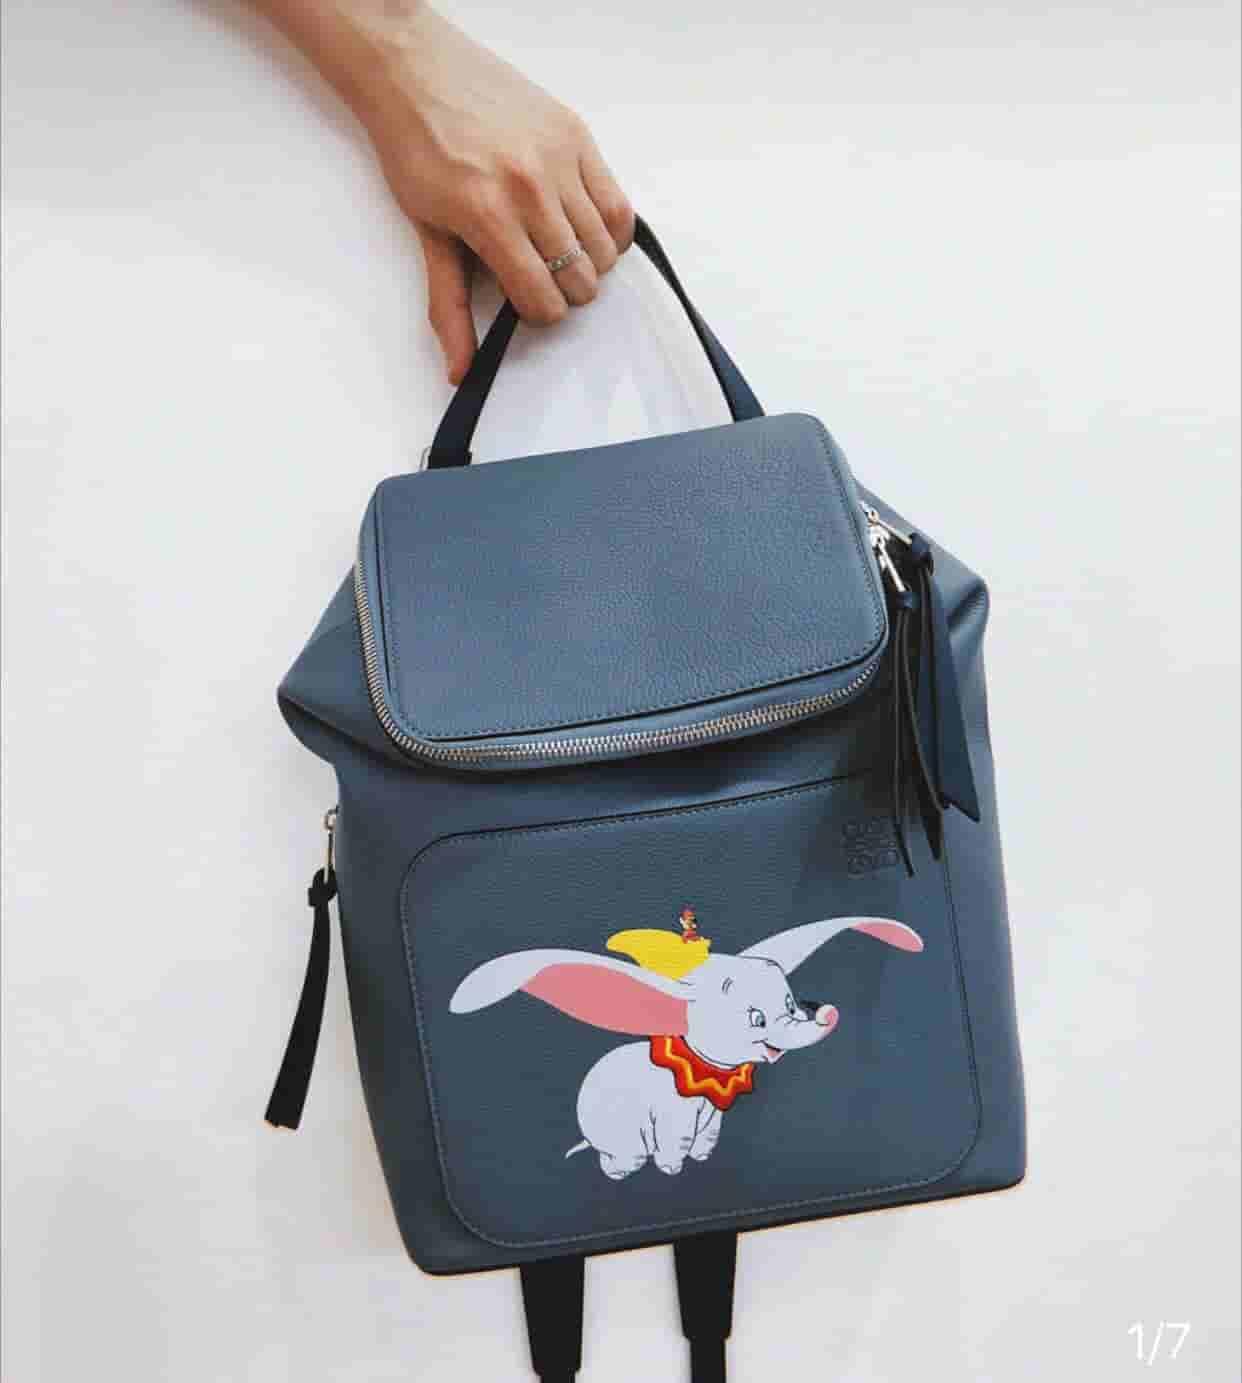 Loewe 刘雯 宋茜 欧阳娜娜同款小飞象系列Goya双肩包